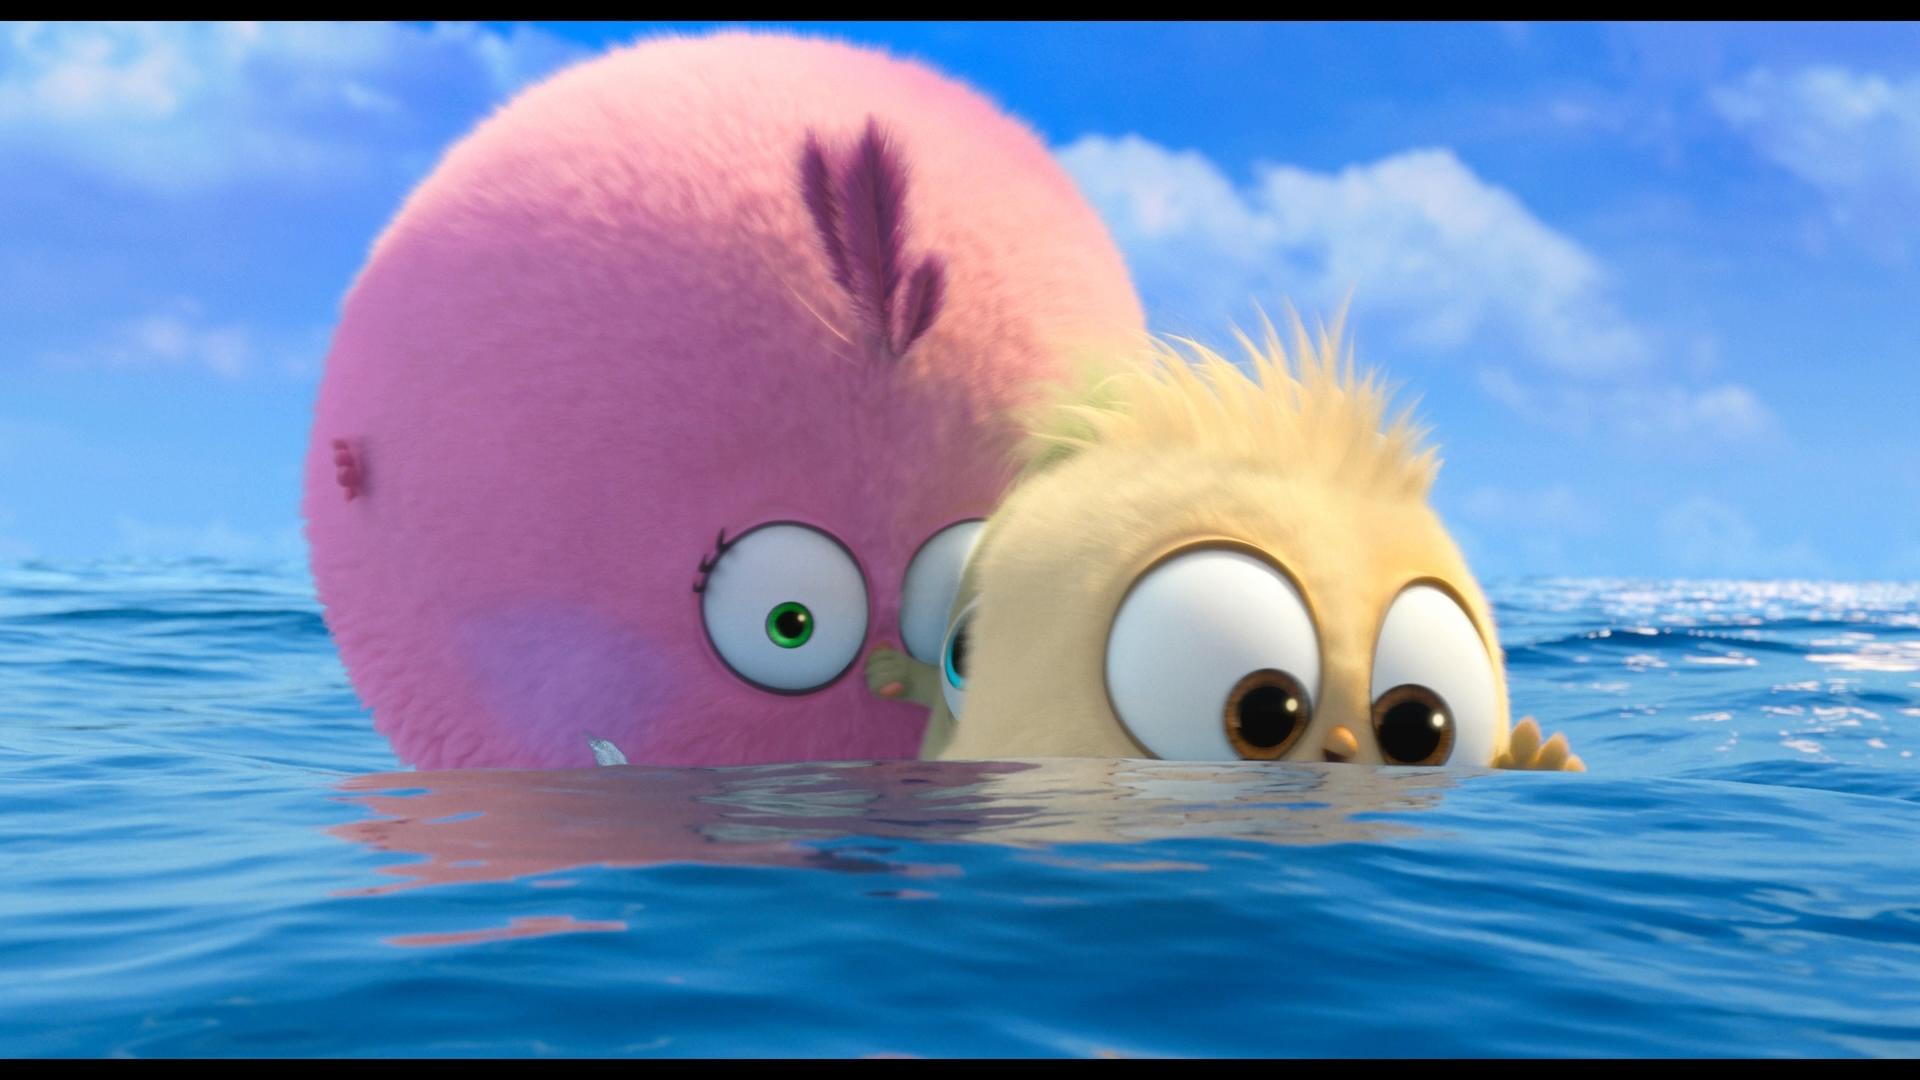 Angry Birds Duology 1080p BluRay REMUX AVC DTS HD MA 7.1 LameyHost ثنائية الطيور الغاضبة مدبلج للعربية تحميل تورنت 4 arabp2p.com